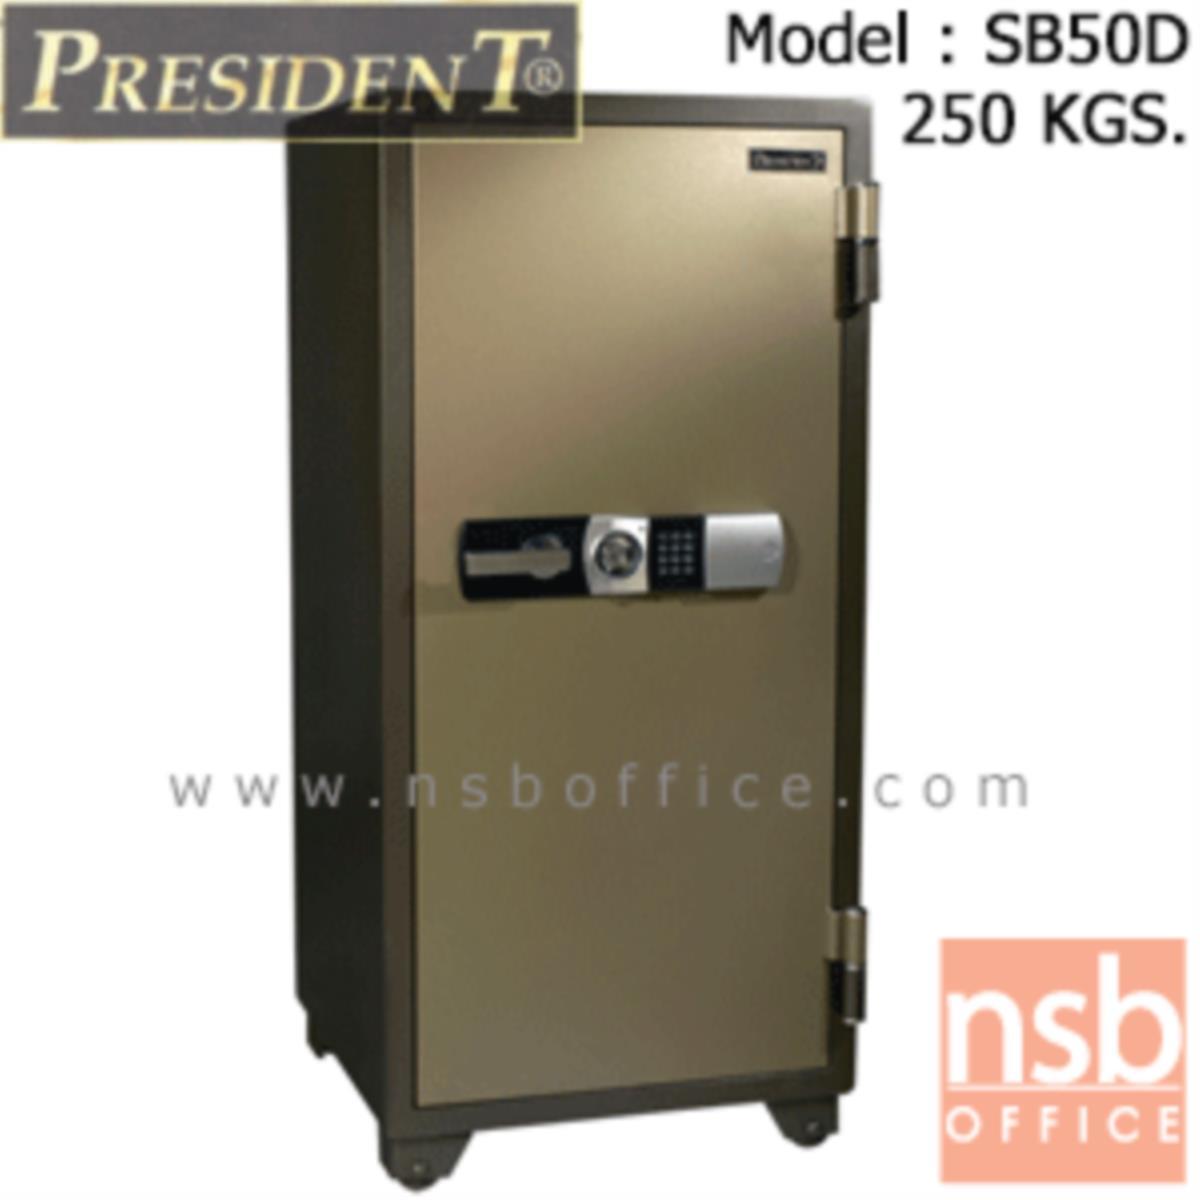 F05A015:ตู้เซฟนิรภัยชนิดดิจิตอล 250 กก.  รุ่น PRESIDENT-SB50D   มี 1 กุญแจ 1 รหัส (รหัสใช้กดหน้าตู้)